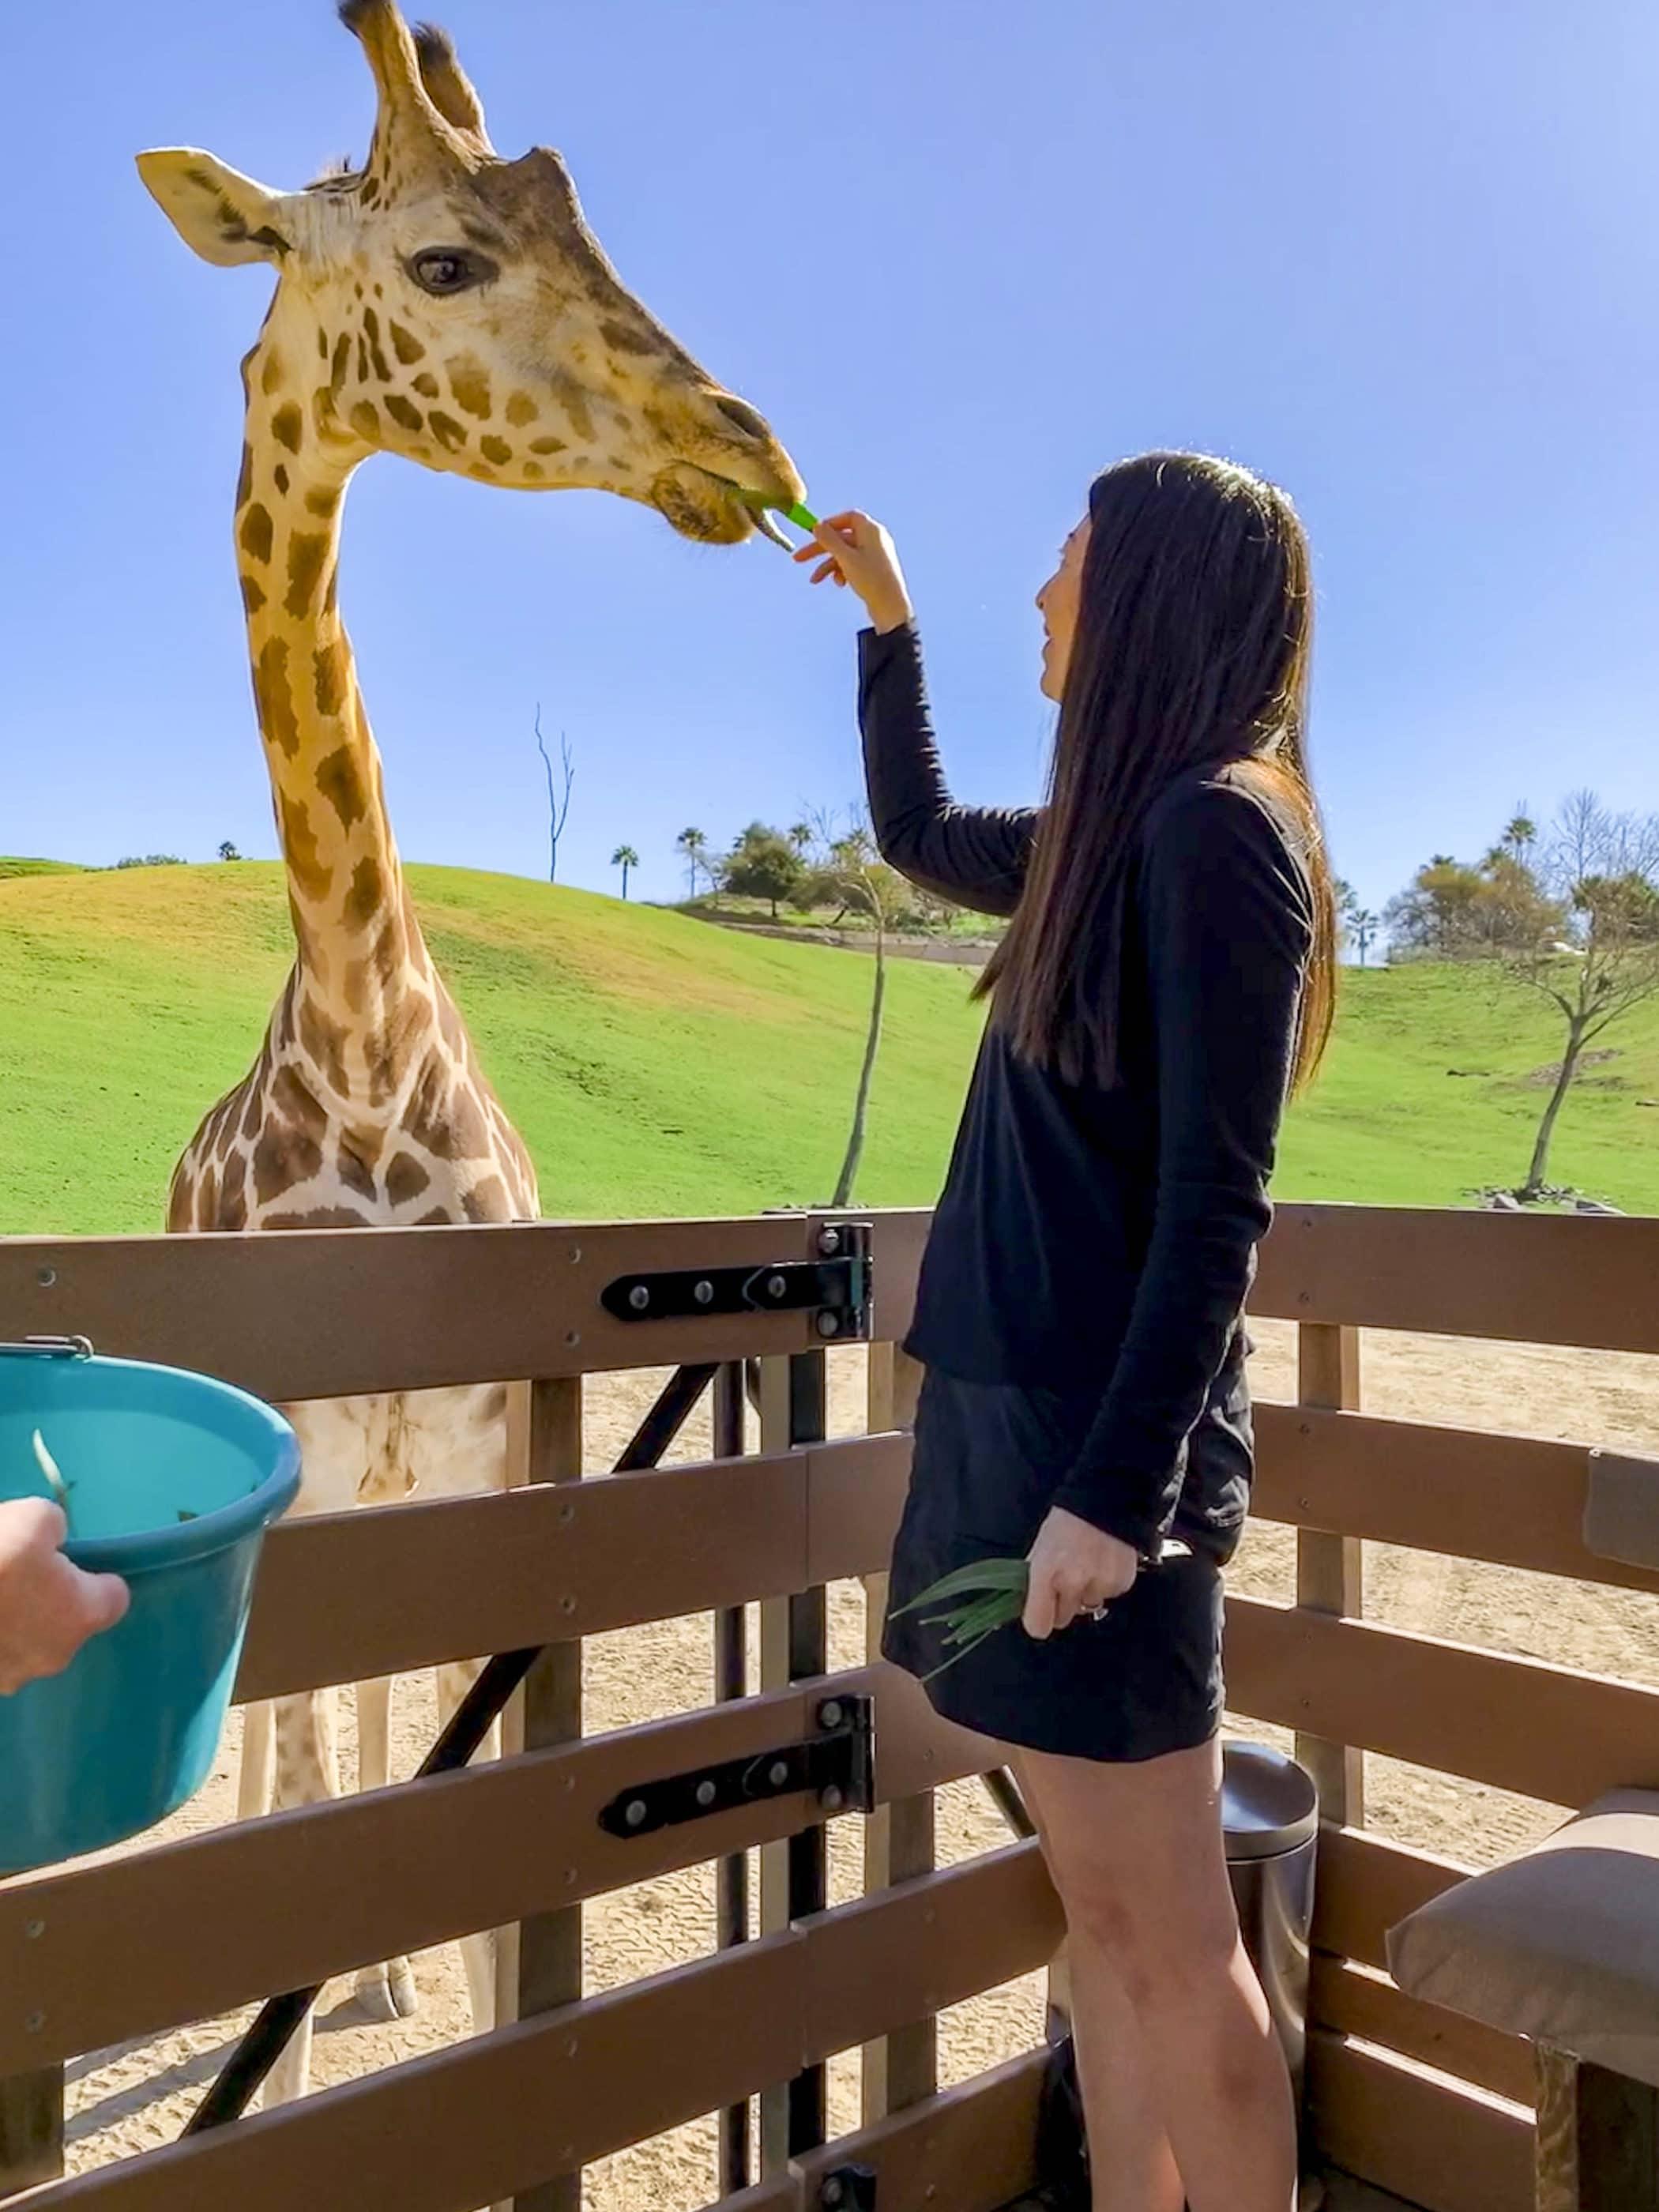 You can feed a giraffe on a Caravan Safari Adventure at San Diego Zoo Safari Park.